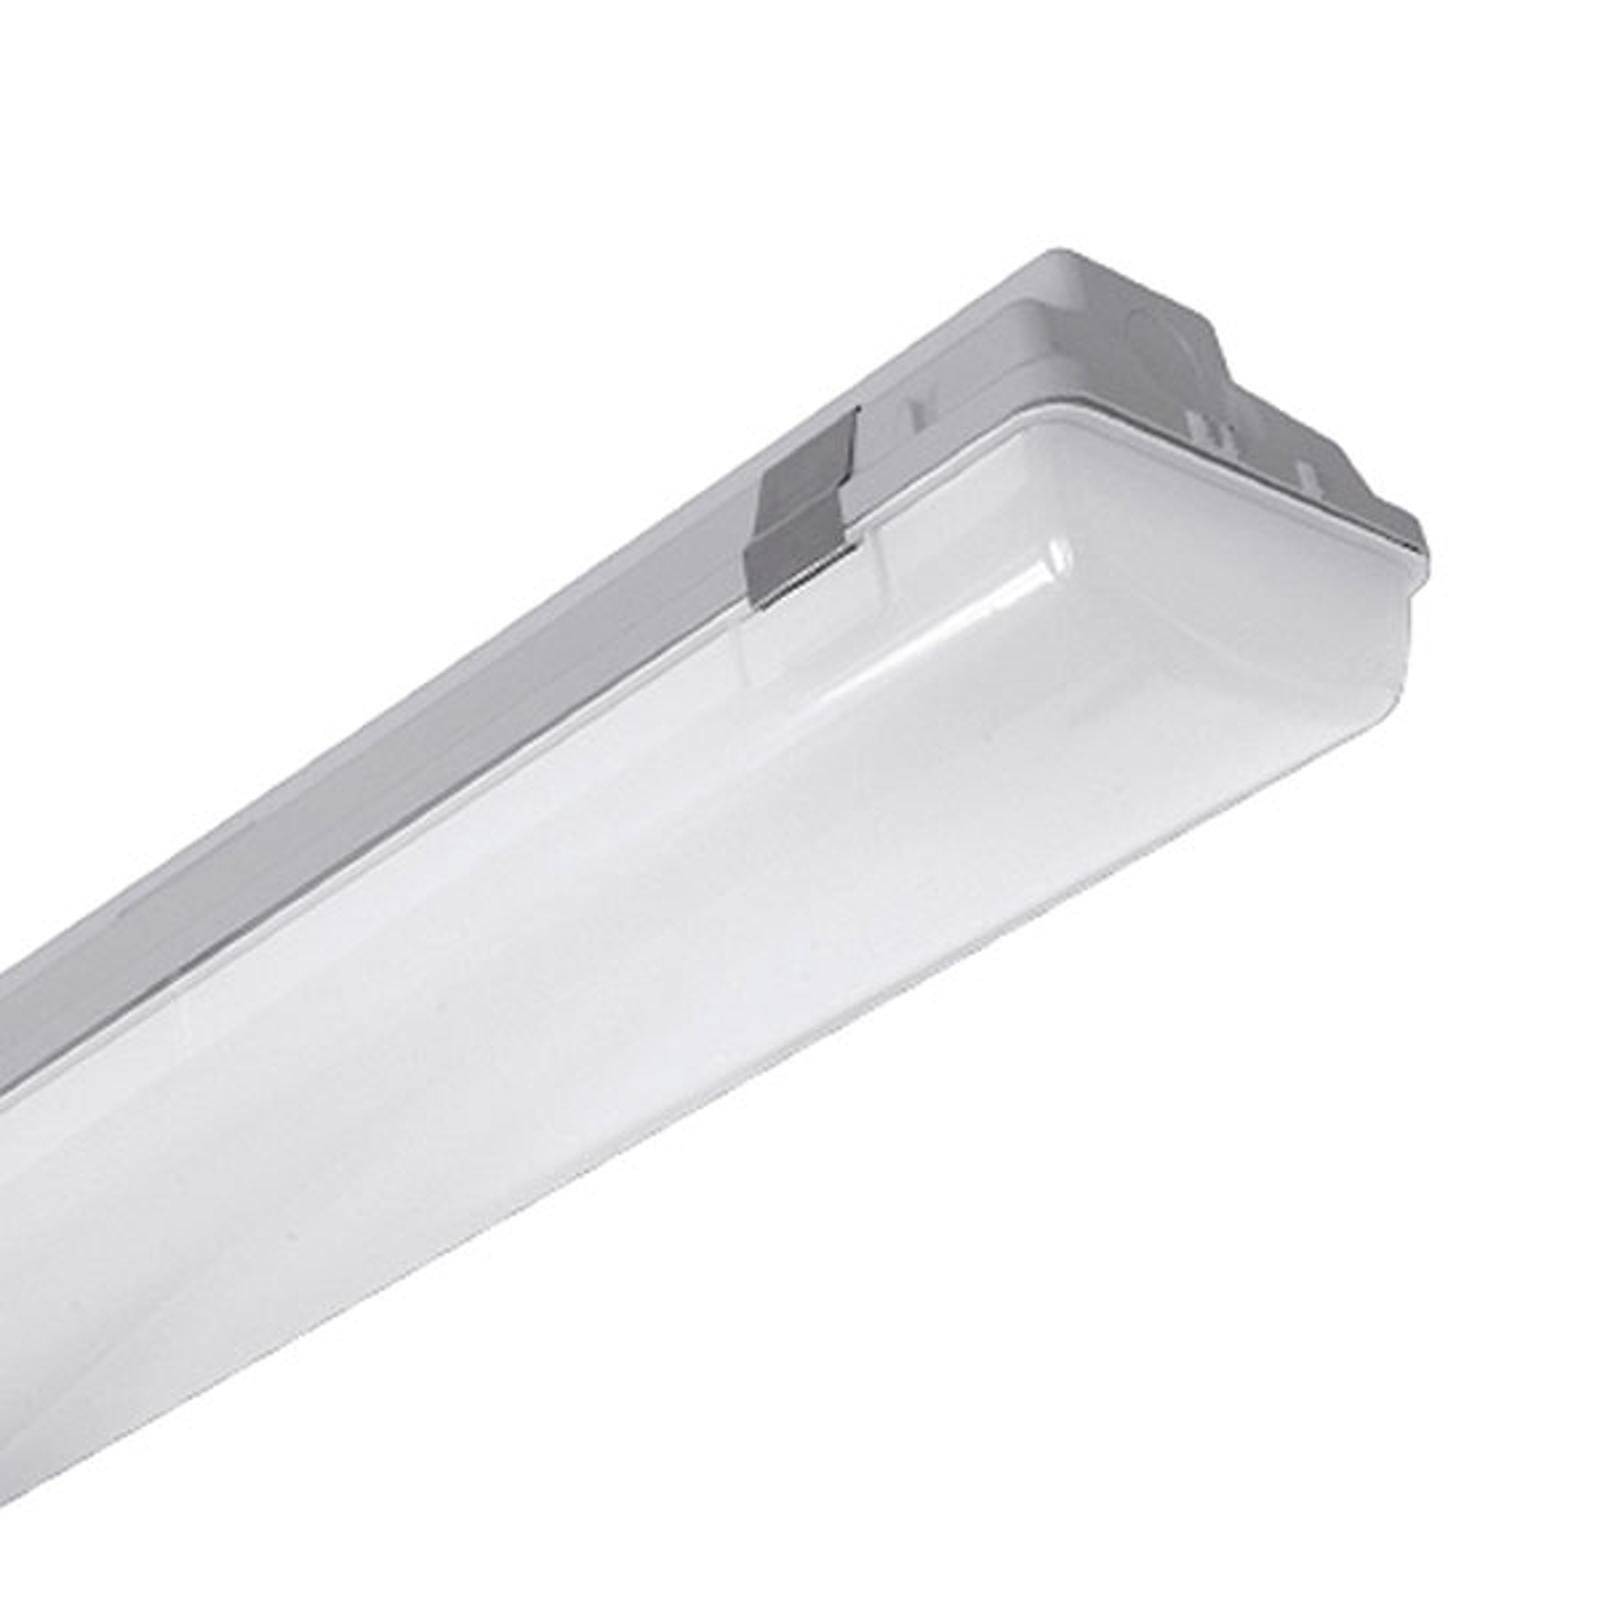 Lampa sufitowa Acro XS Fortiled 54W